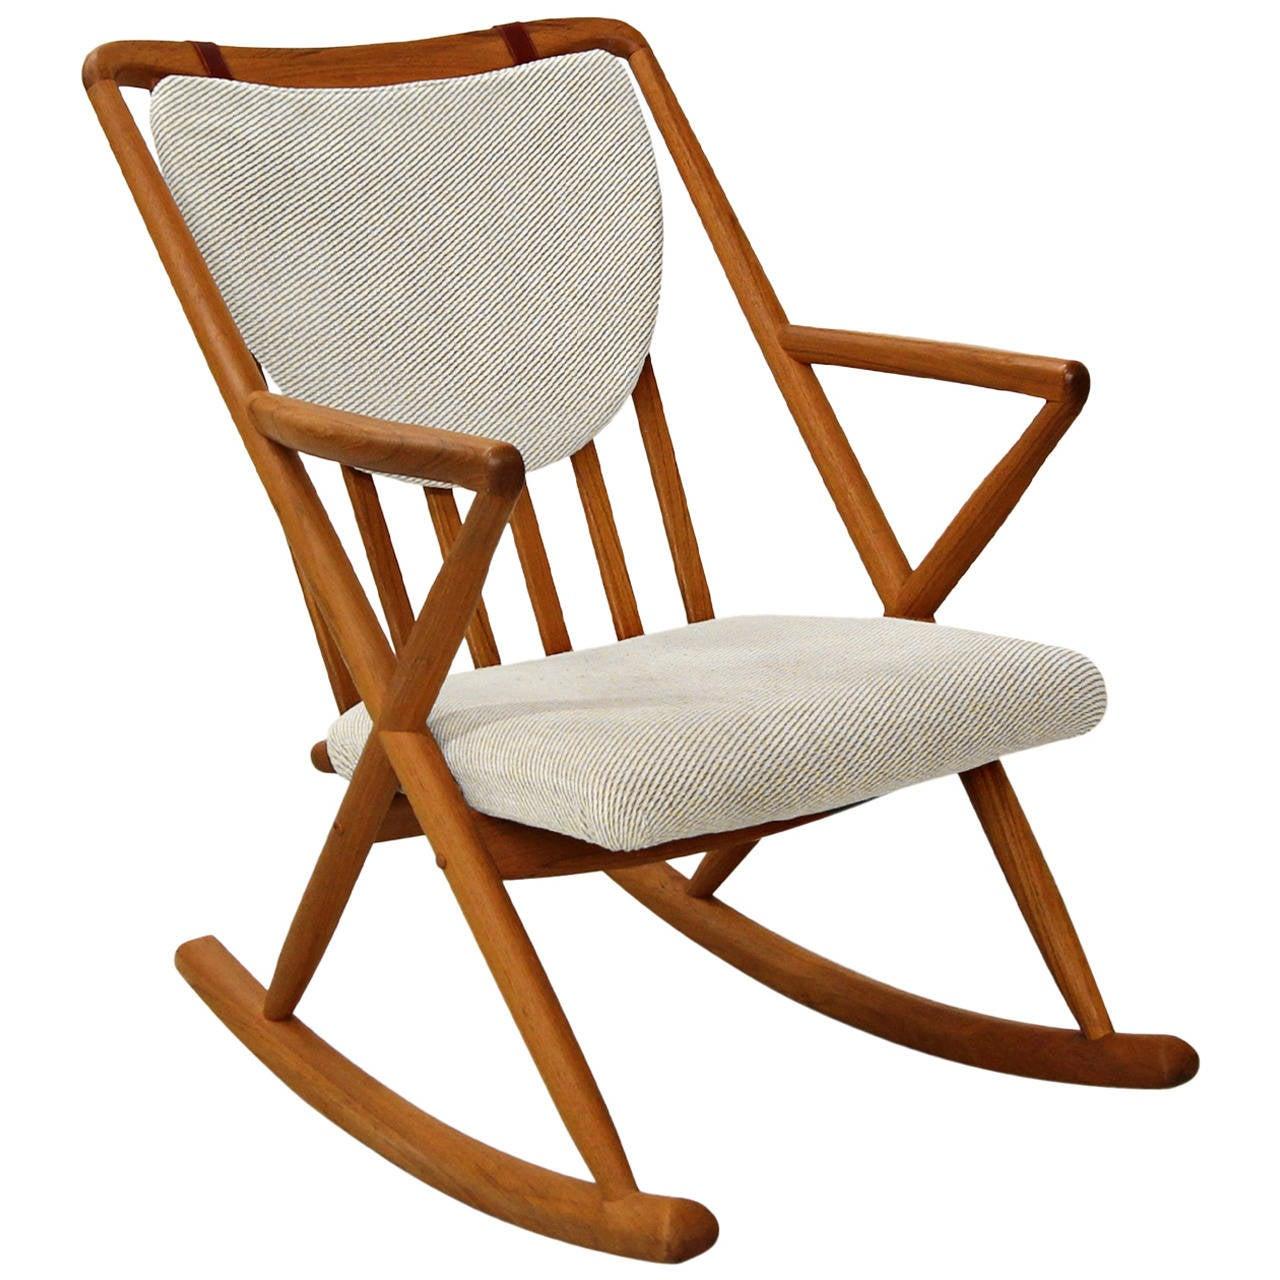 Frank reenskaug rocking chair - Danish Teak Rocking Chair In The Manner Of Frank Reenskaug For Bramin 1